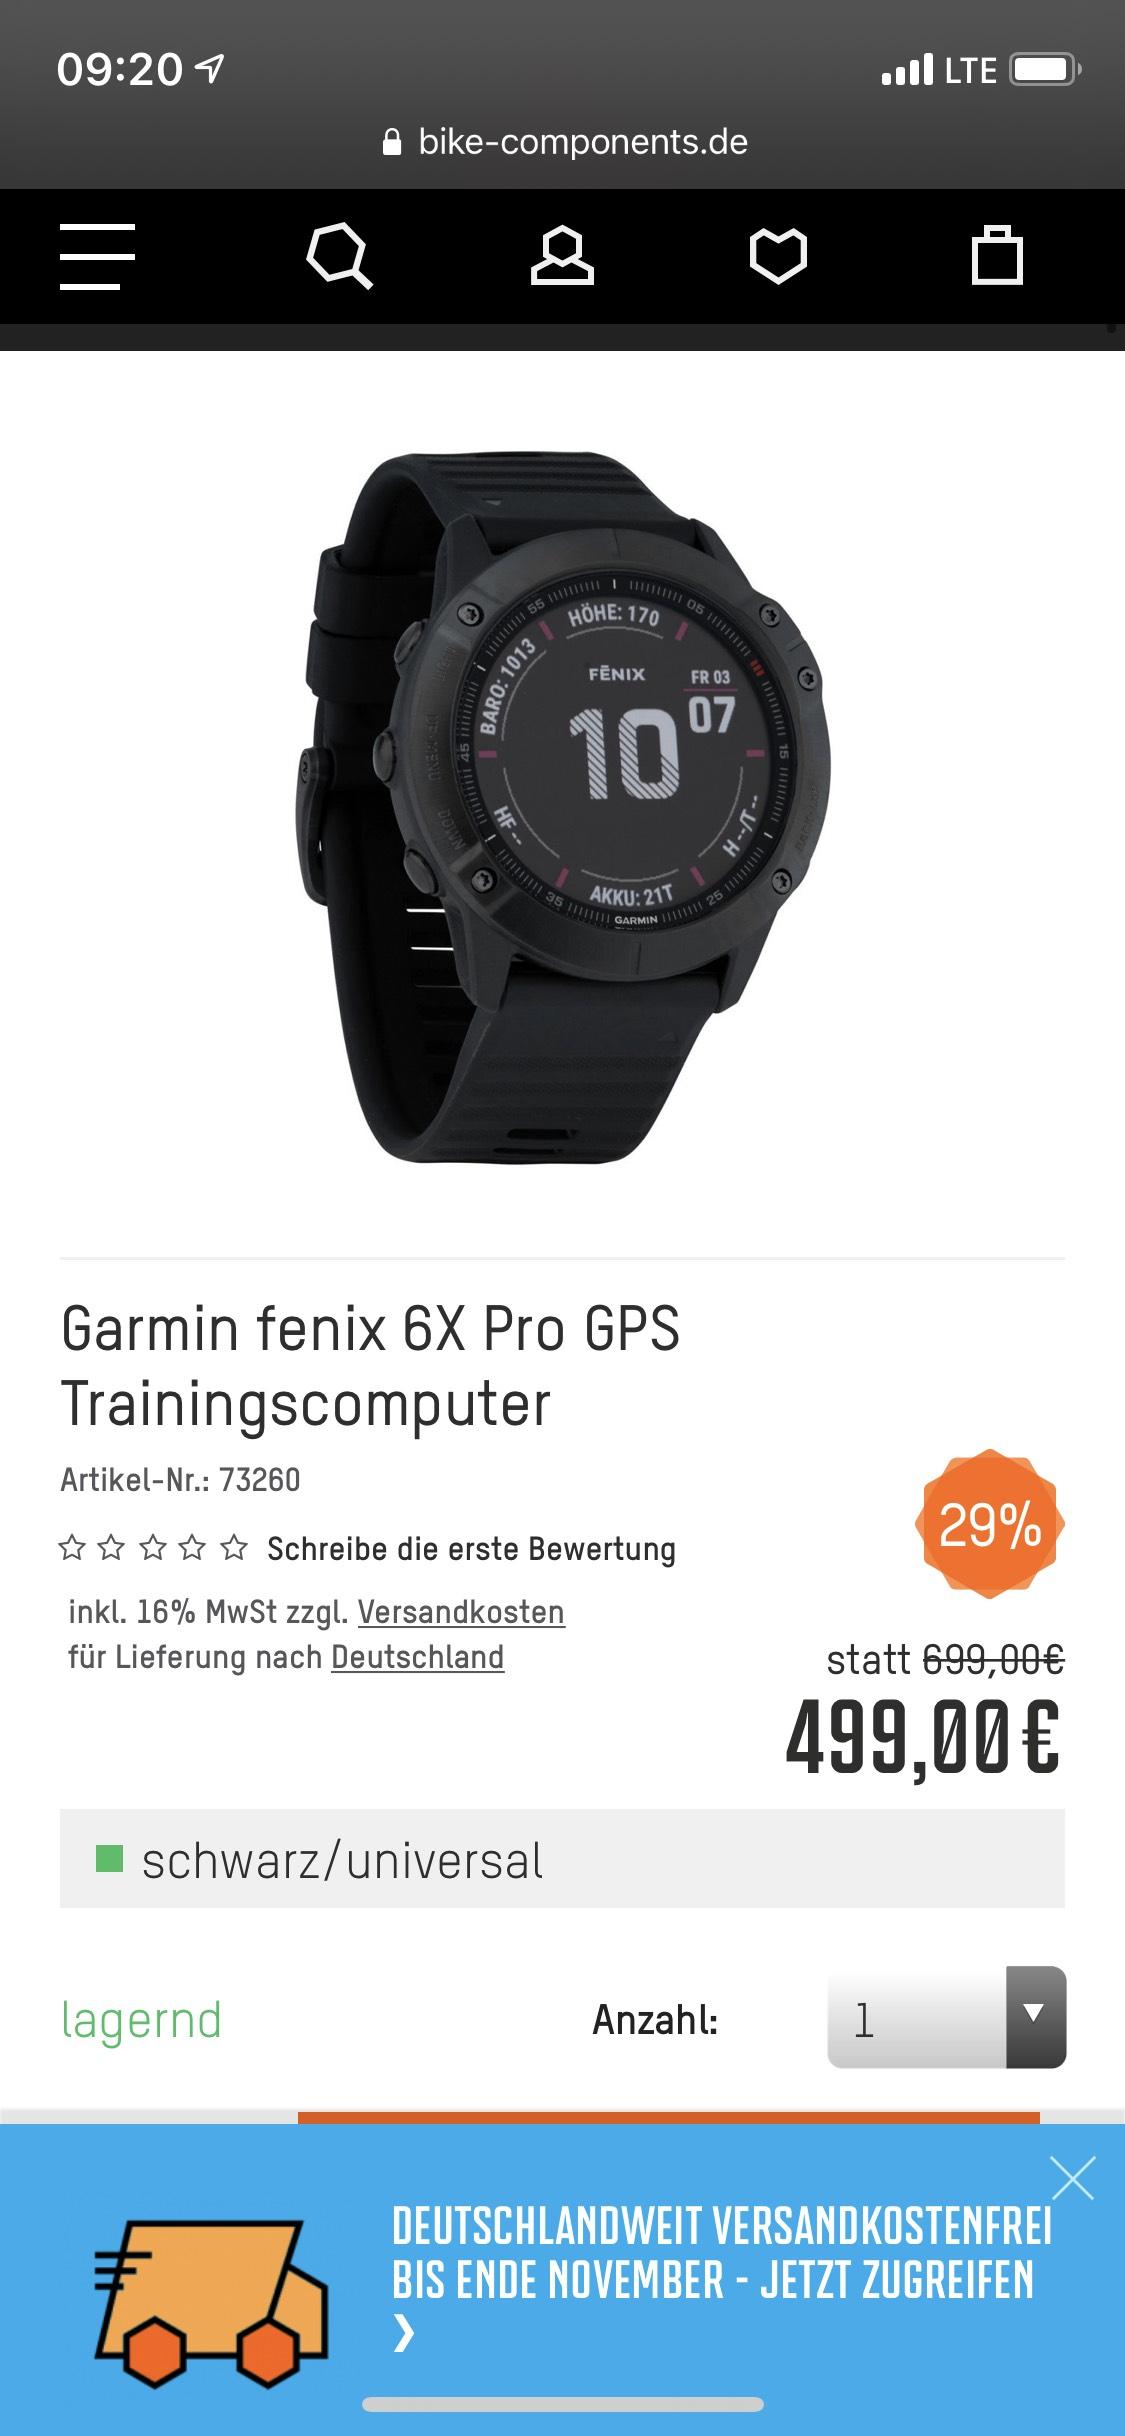 Amazon und Bike-Components: Garmin Fenix 6X Pro Premium-GPS-Multisportuhr